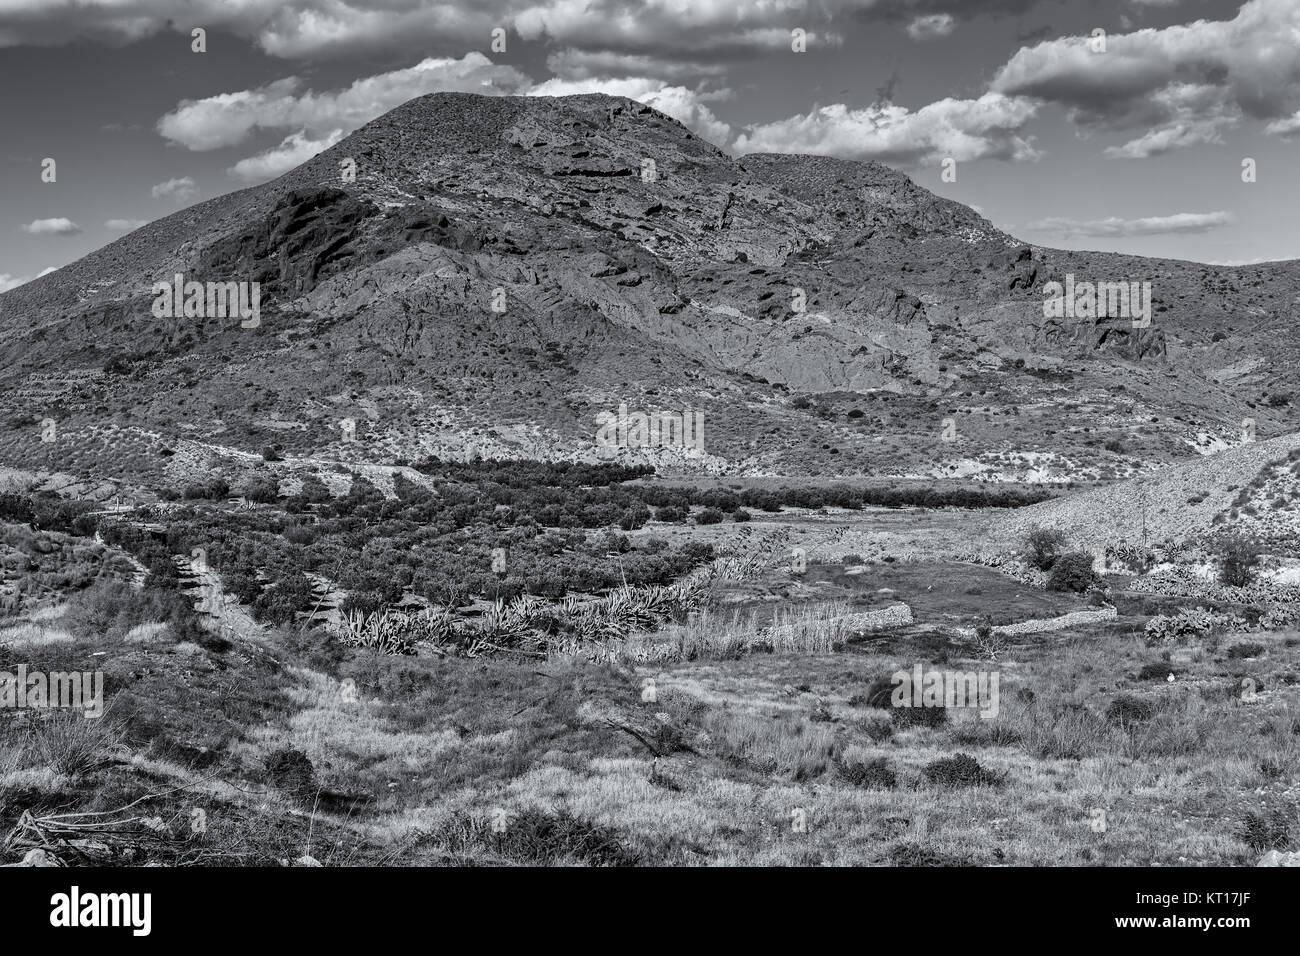 Landscape in the Valle de Rodalquilar. Natural Park of Cabo de Gata. Spain. Stock Photo